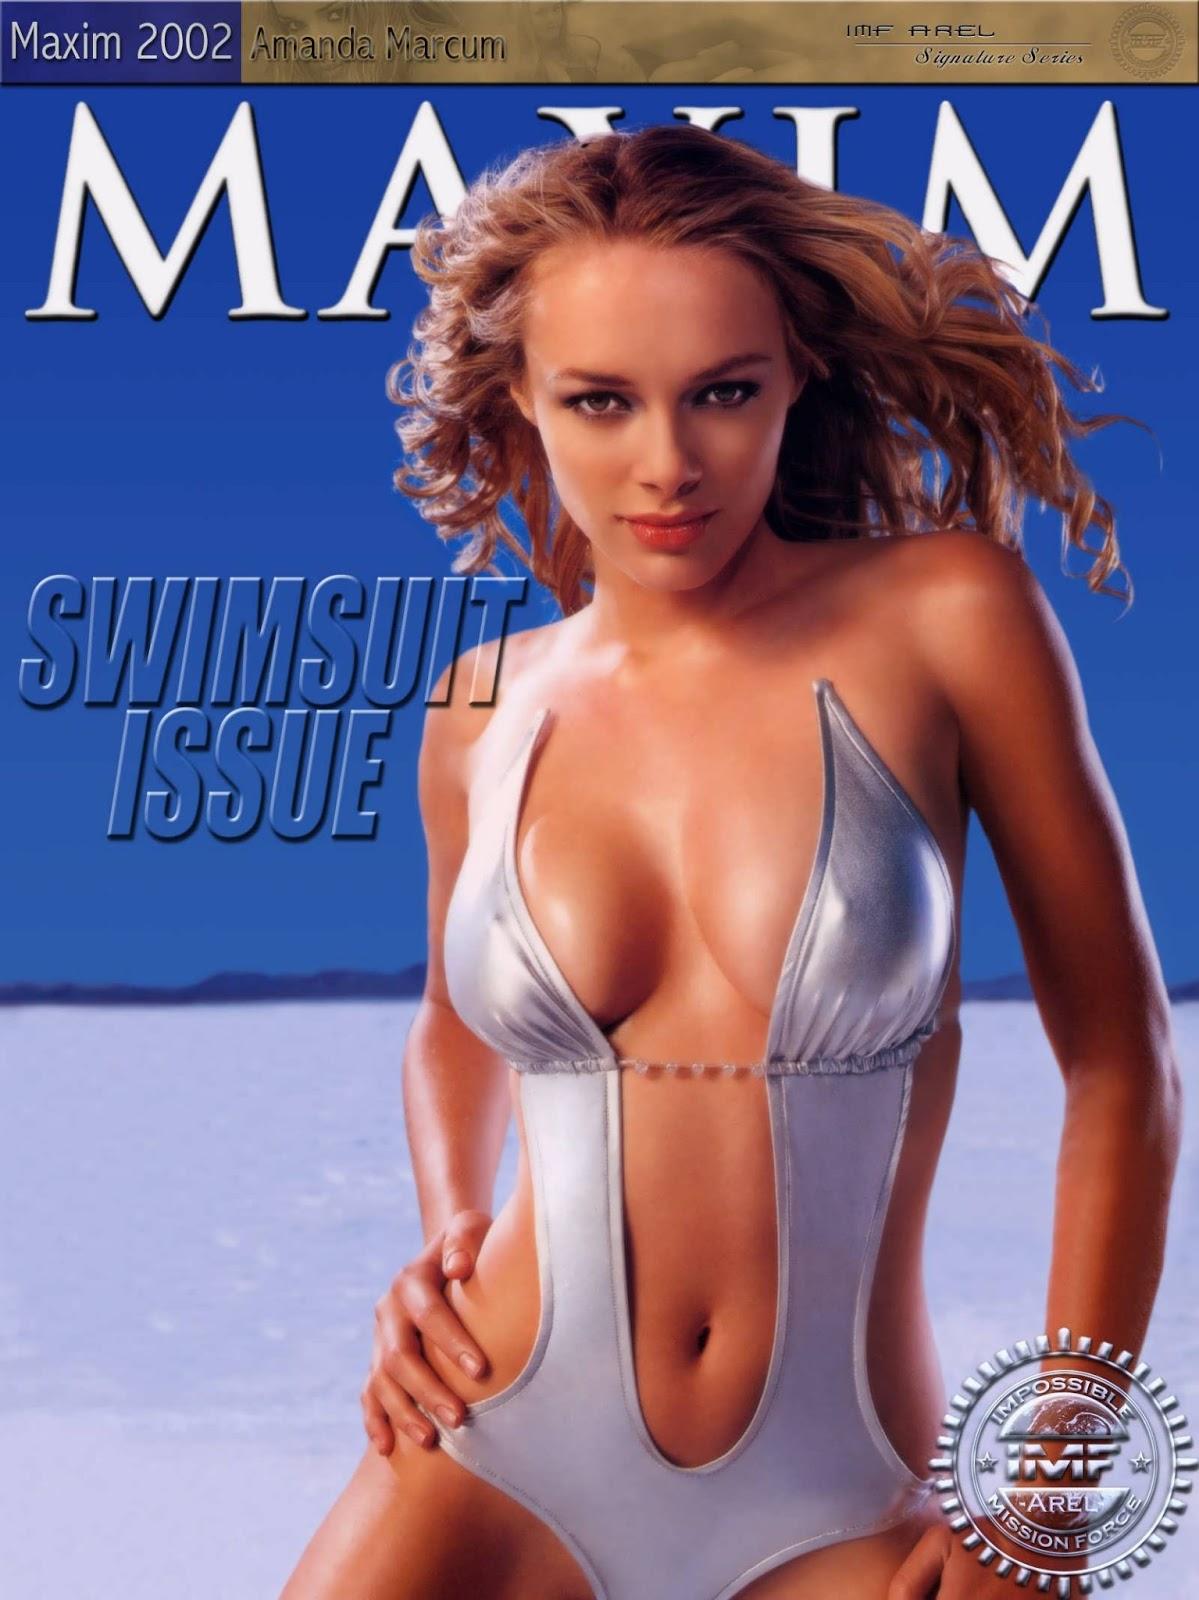 amanda marcum usa hot and beautiful women of the world